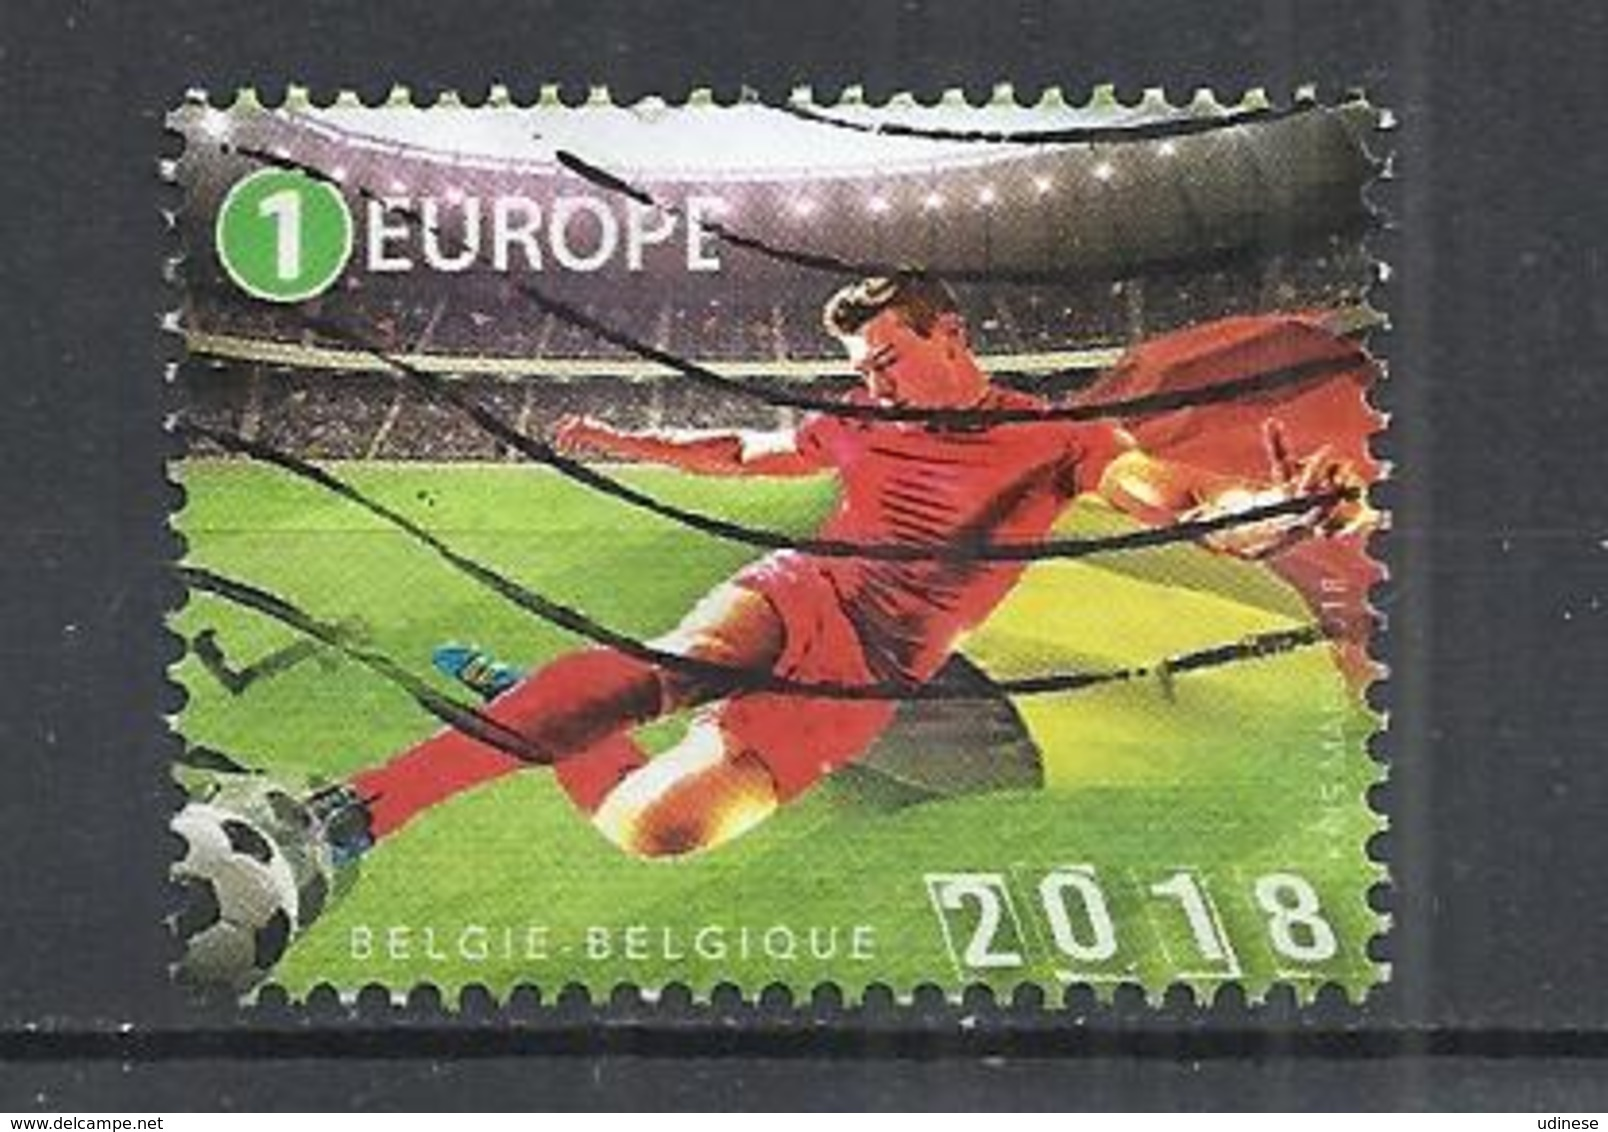 BELGIUM 2018 - WORLD CUP FOOTBALL - USED OBLITERE GESTEMPELT USADO - Coupe Du Monde